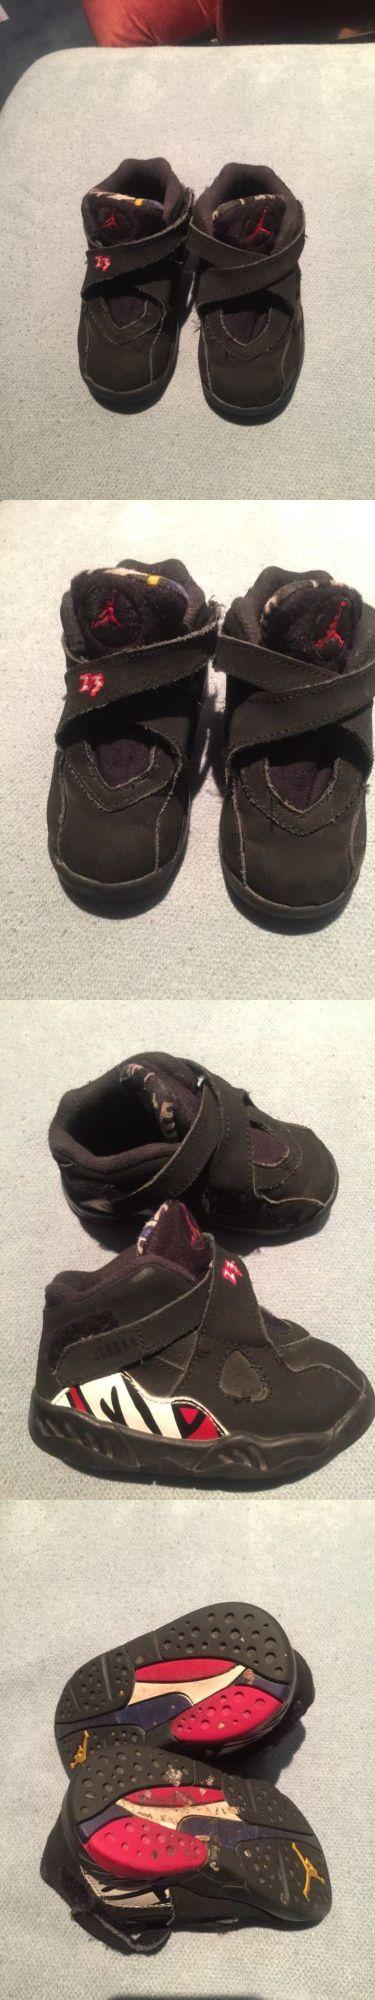 Michael Jordan Baby Clothing: Michael Jordan Toddler Size 6C Boy Or Girl Sneakers -> BUY IT NOW ONLY: $14.99 on eBay!